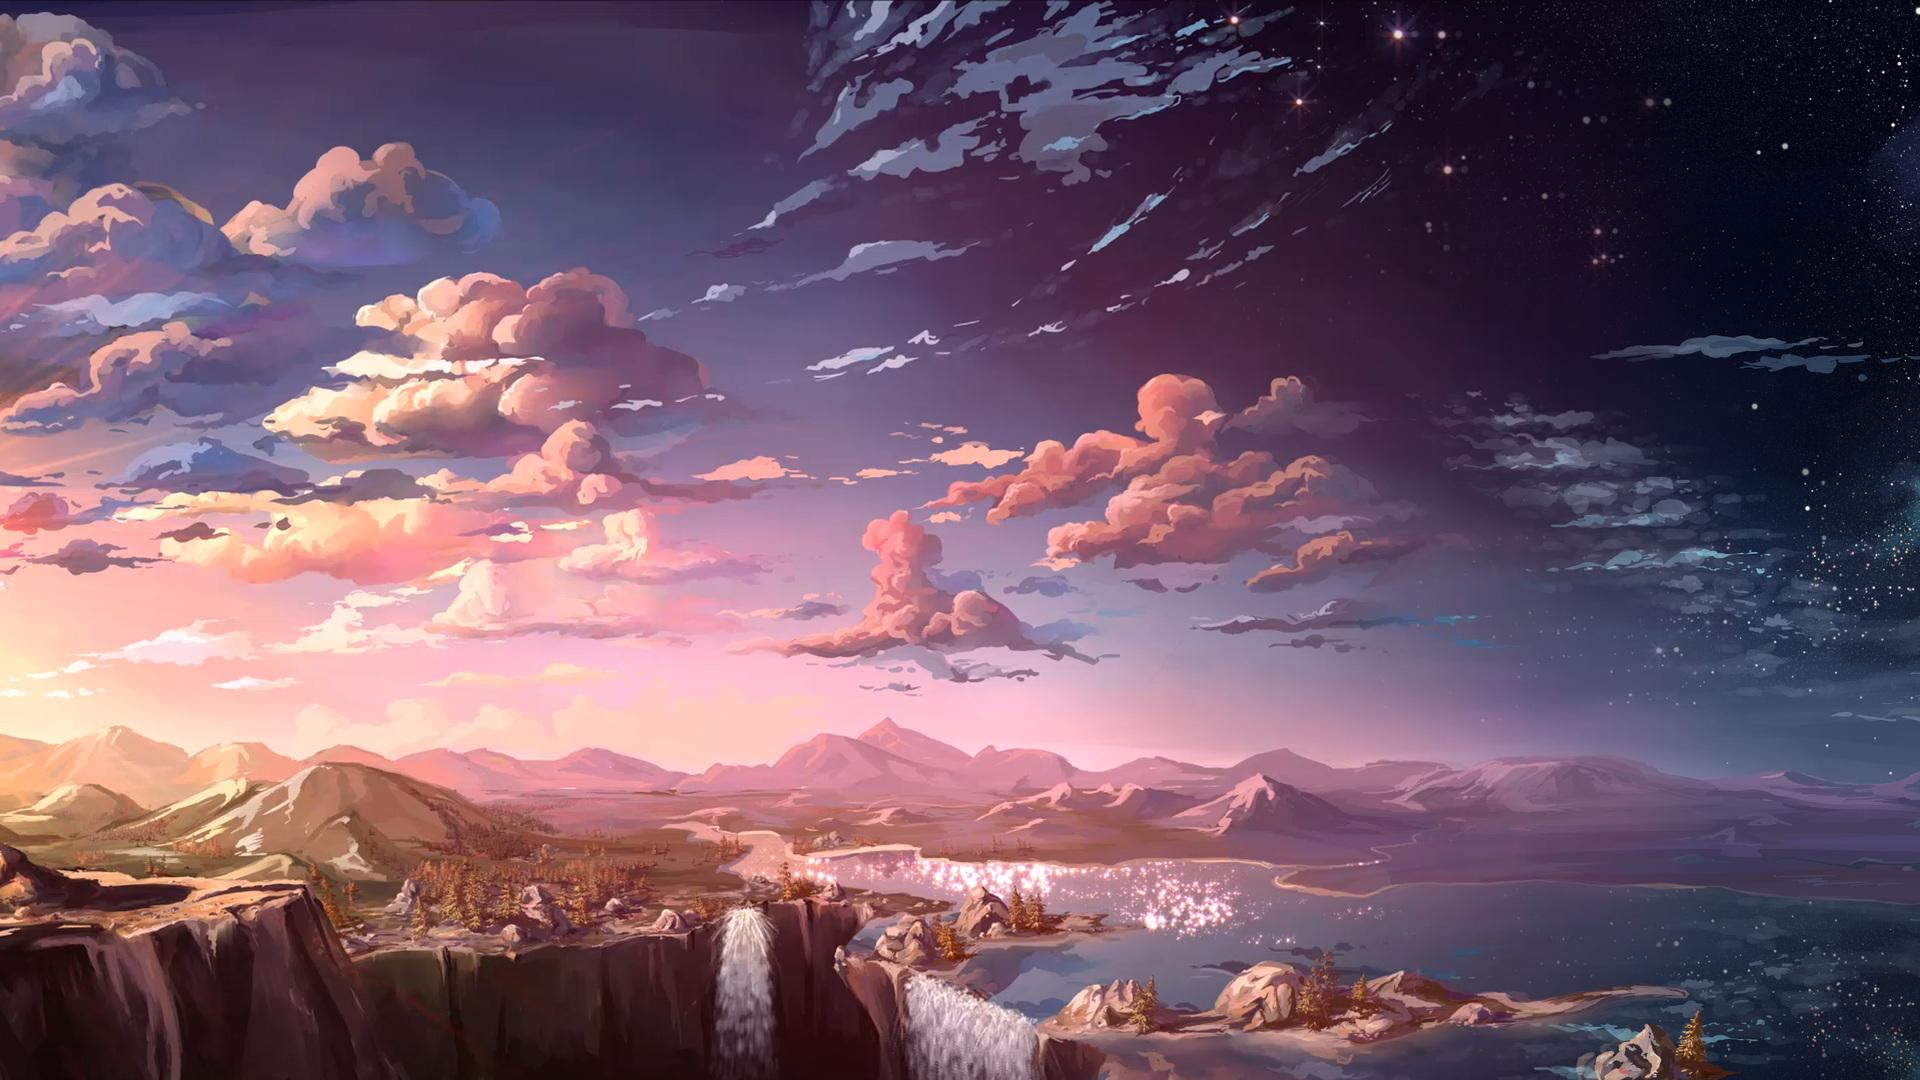 1920x1080 waterfall sunset landscape artist laptop full hd 1080p hd